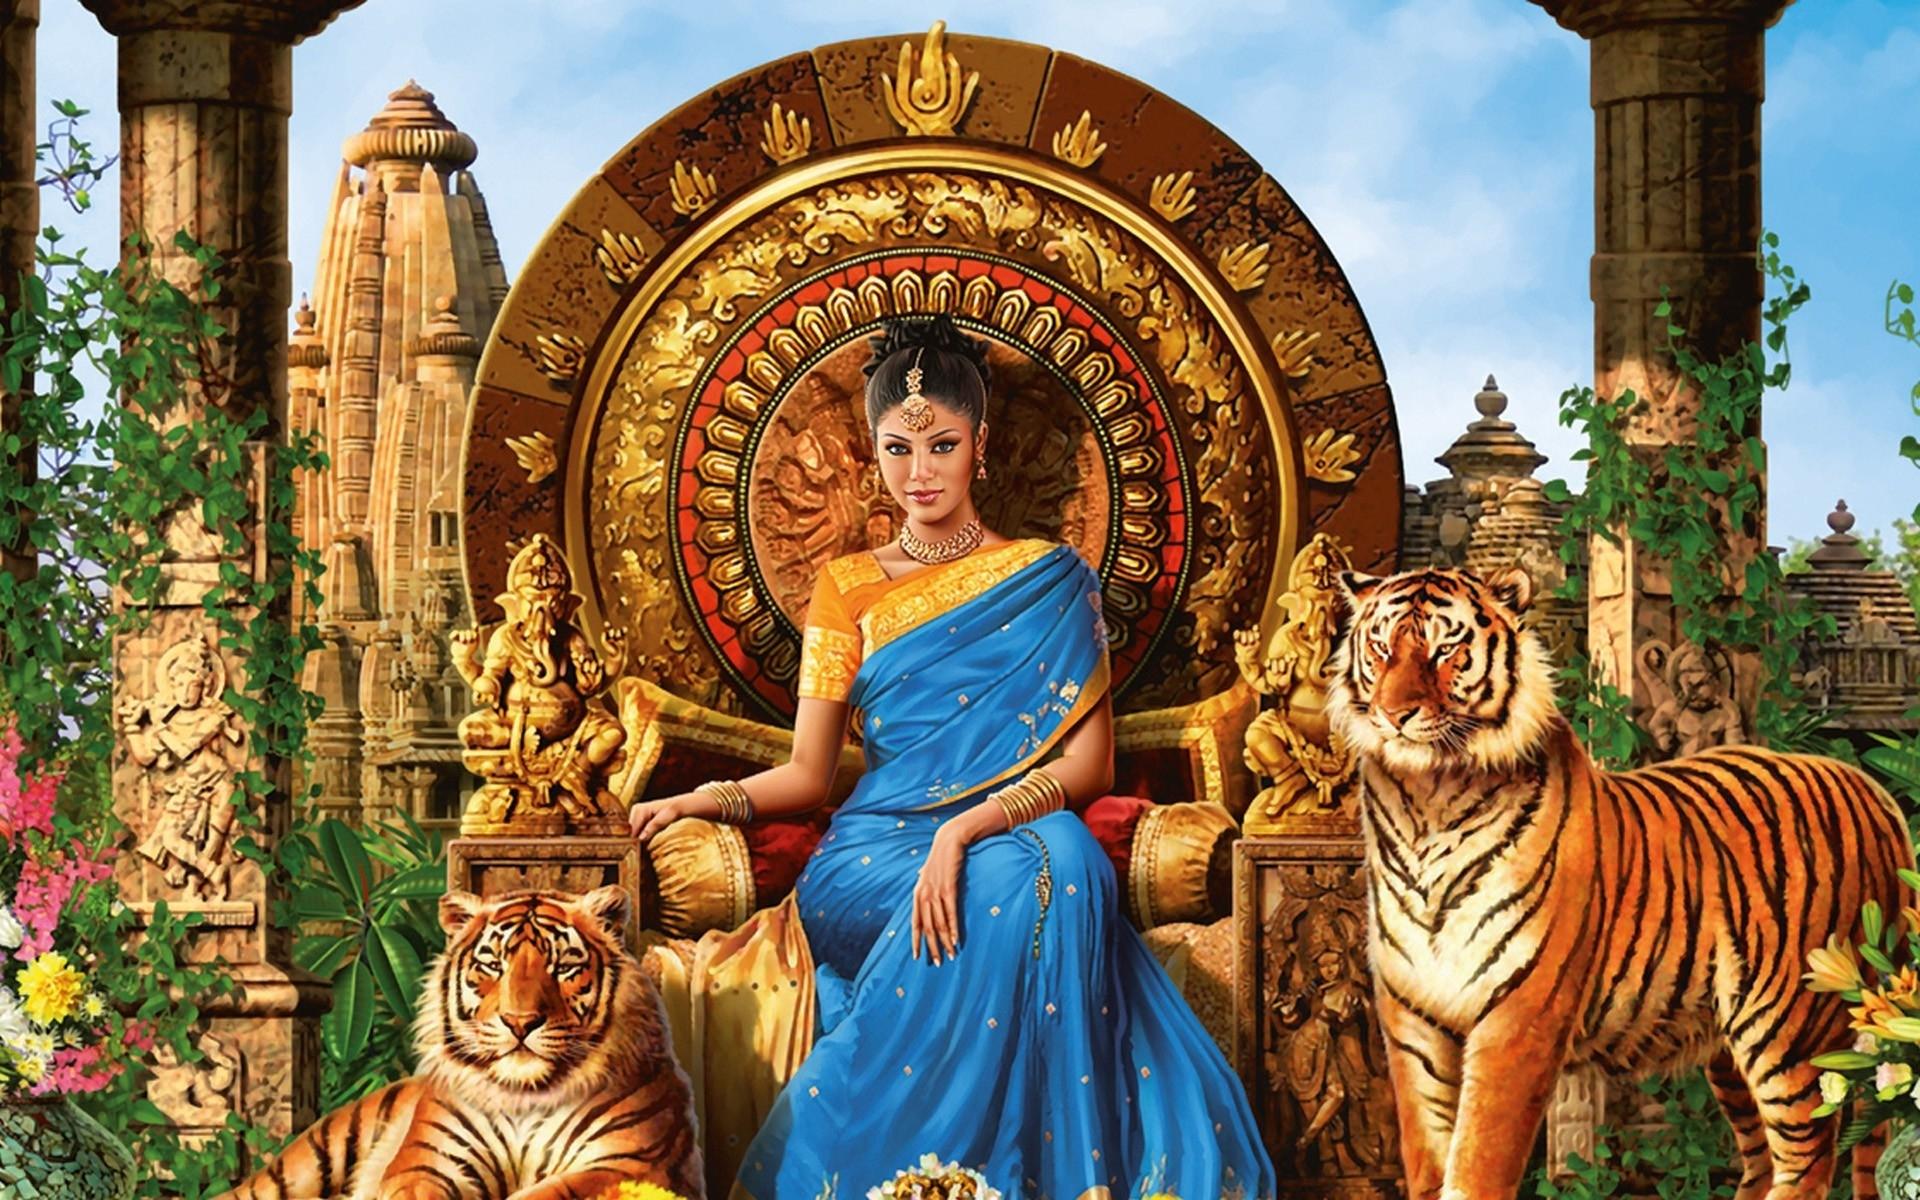 ws_Goddess_Throne_Tigers_Painting_1920x1200.jpg